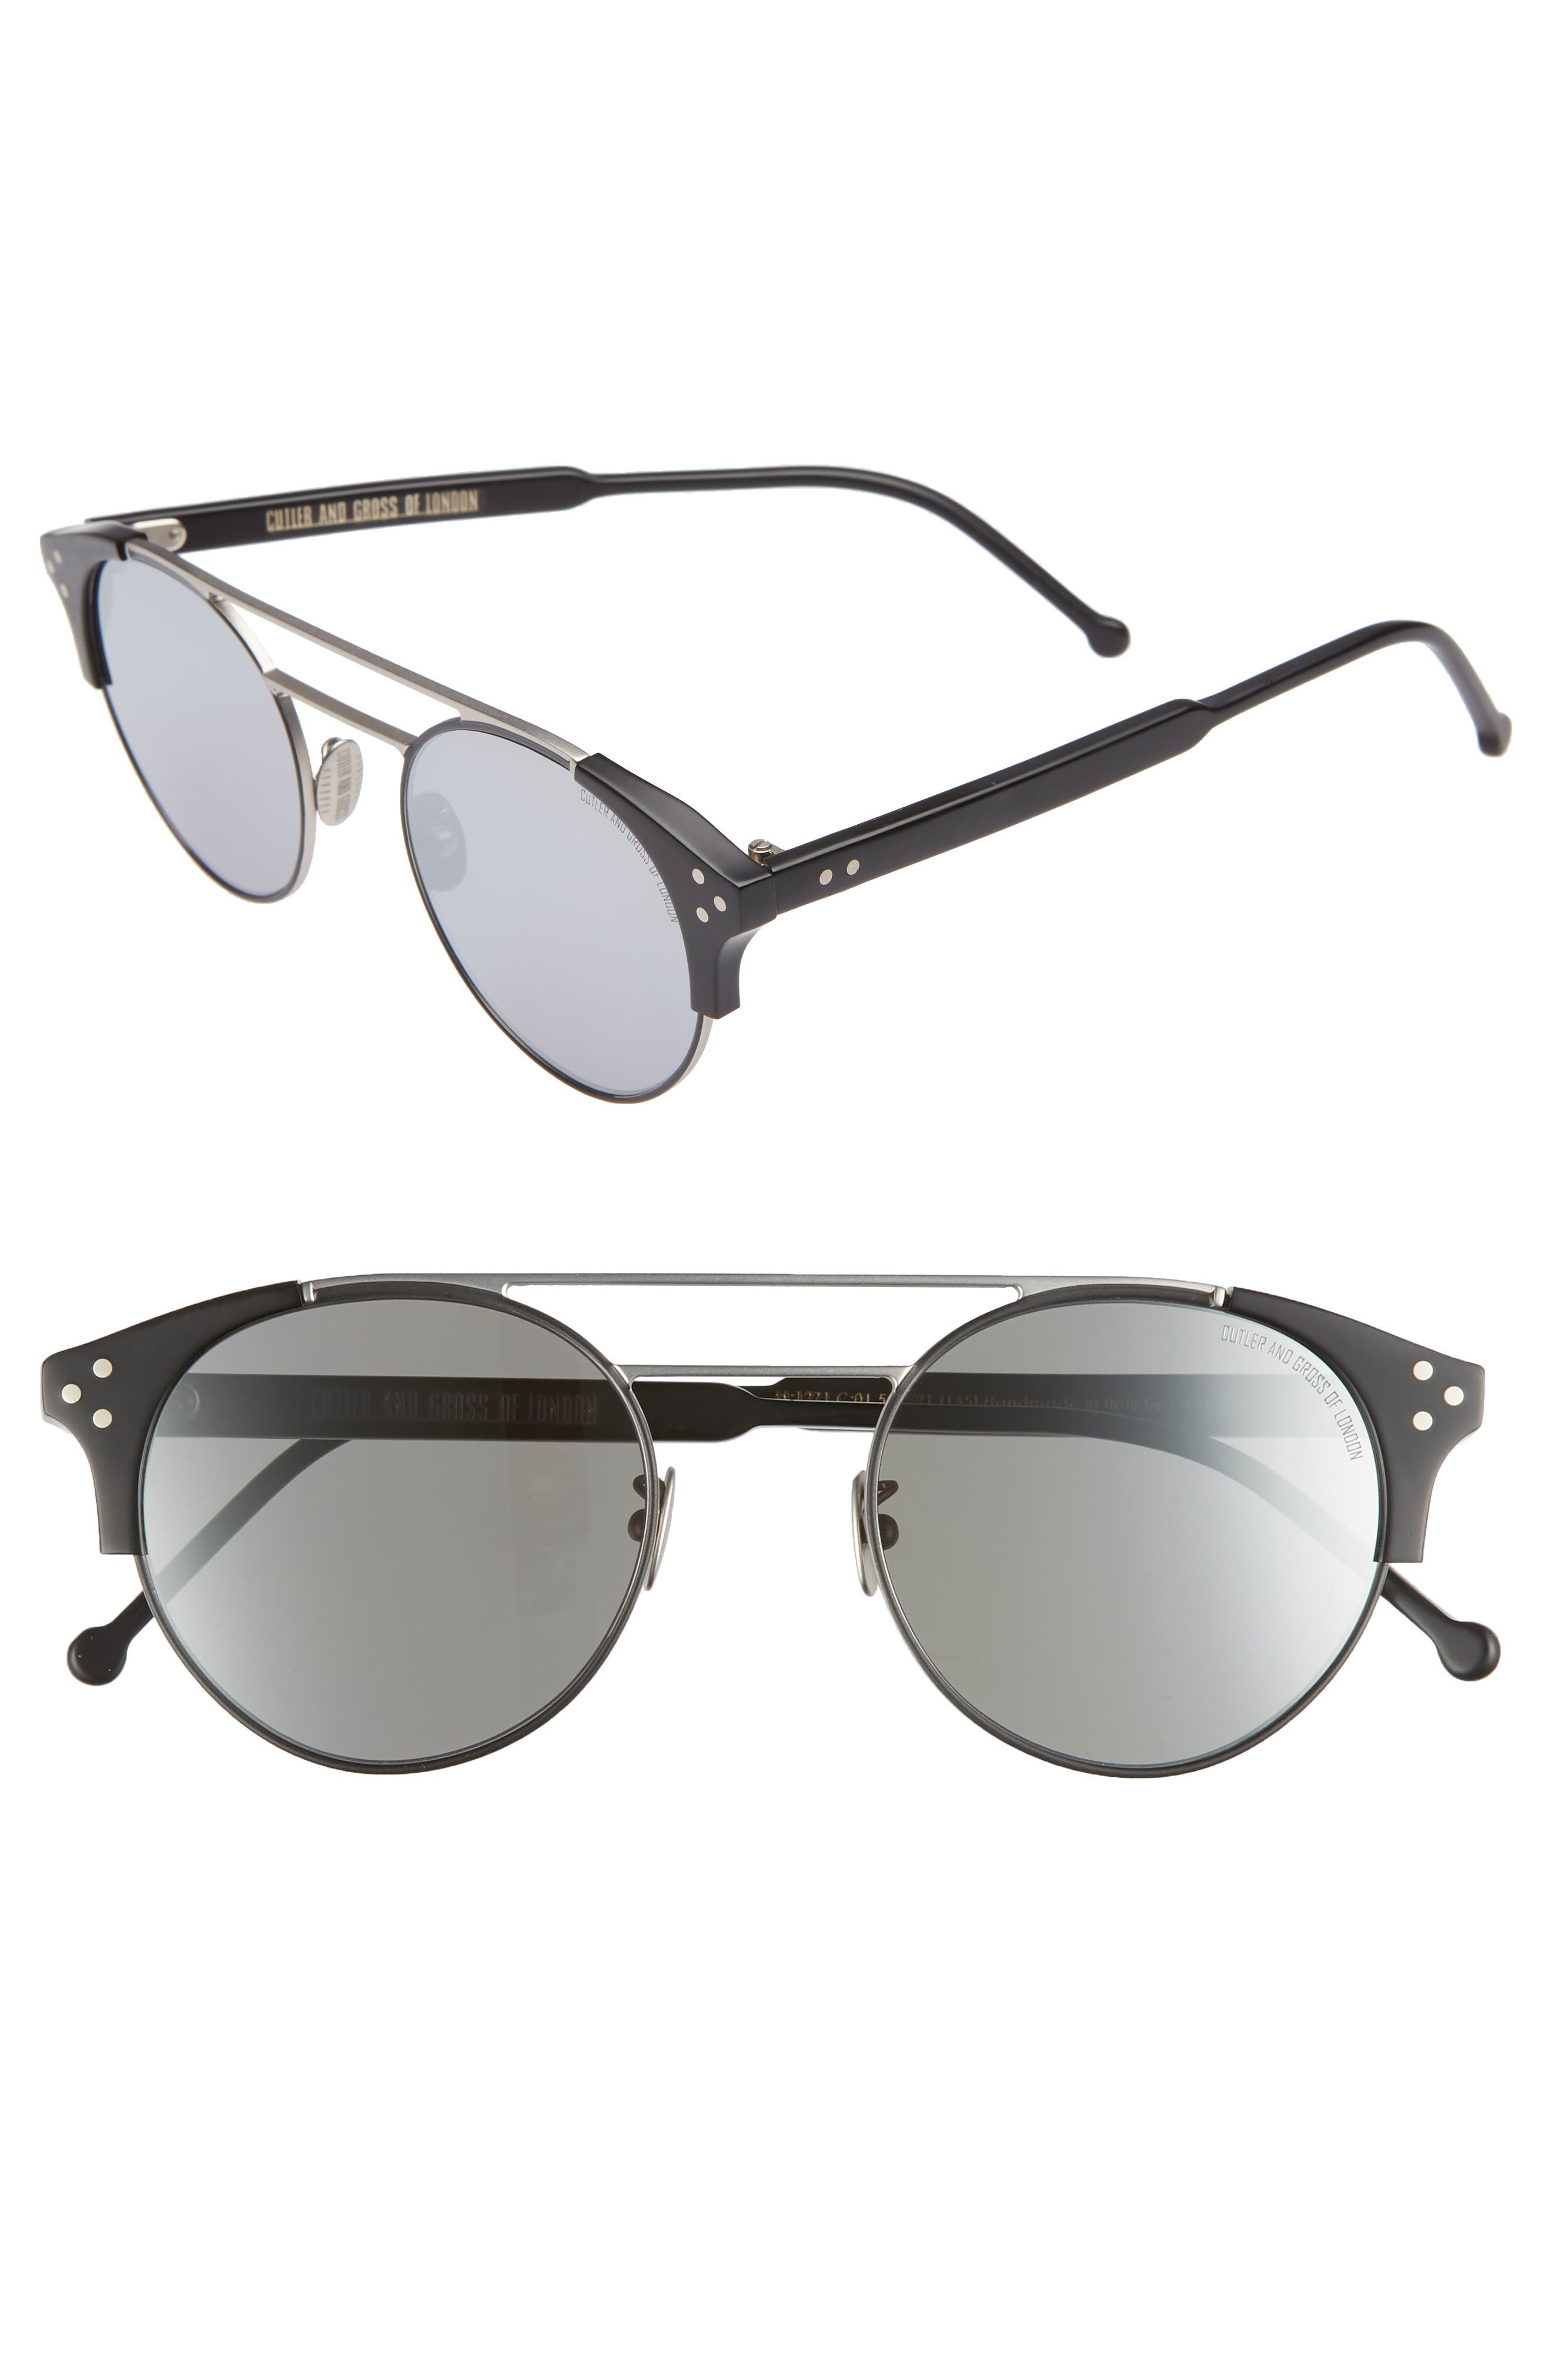 50mm Polarized Round Sunglasses,                         Main,                         color, PALLADIUM AND BLACK/ SILVER